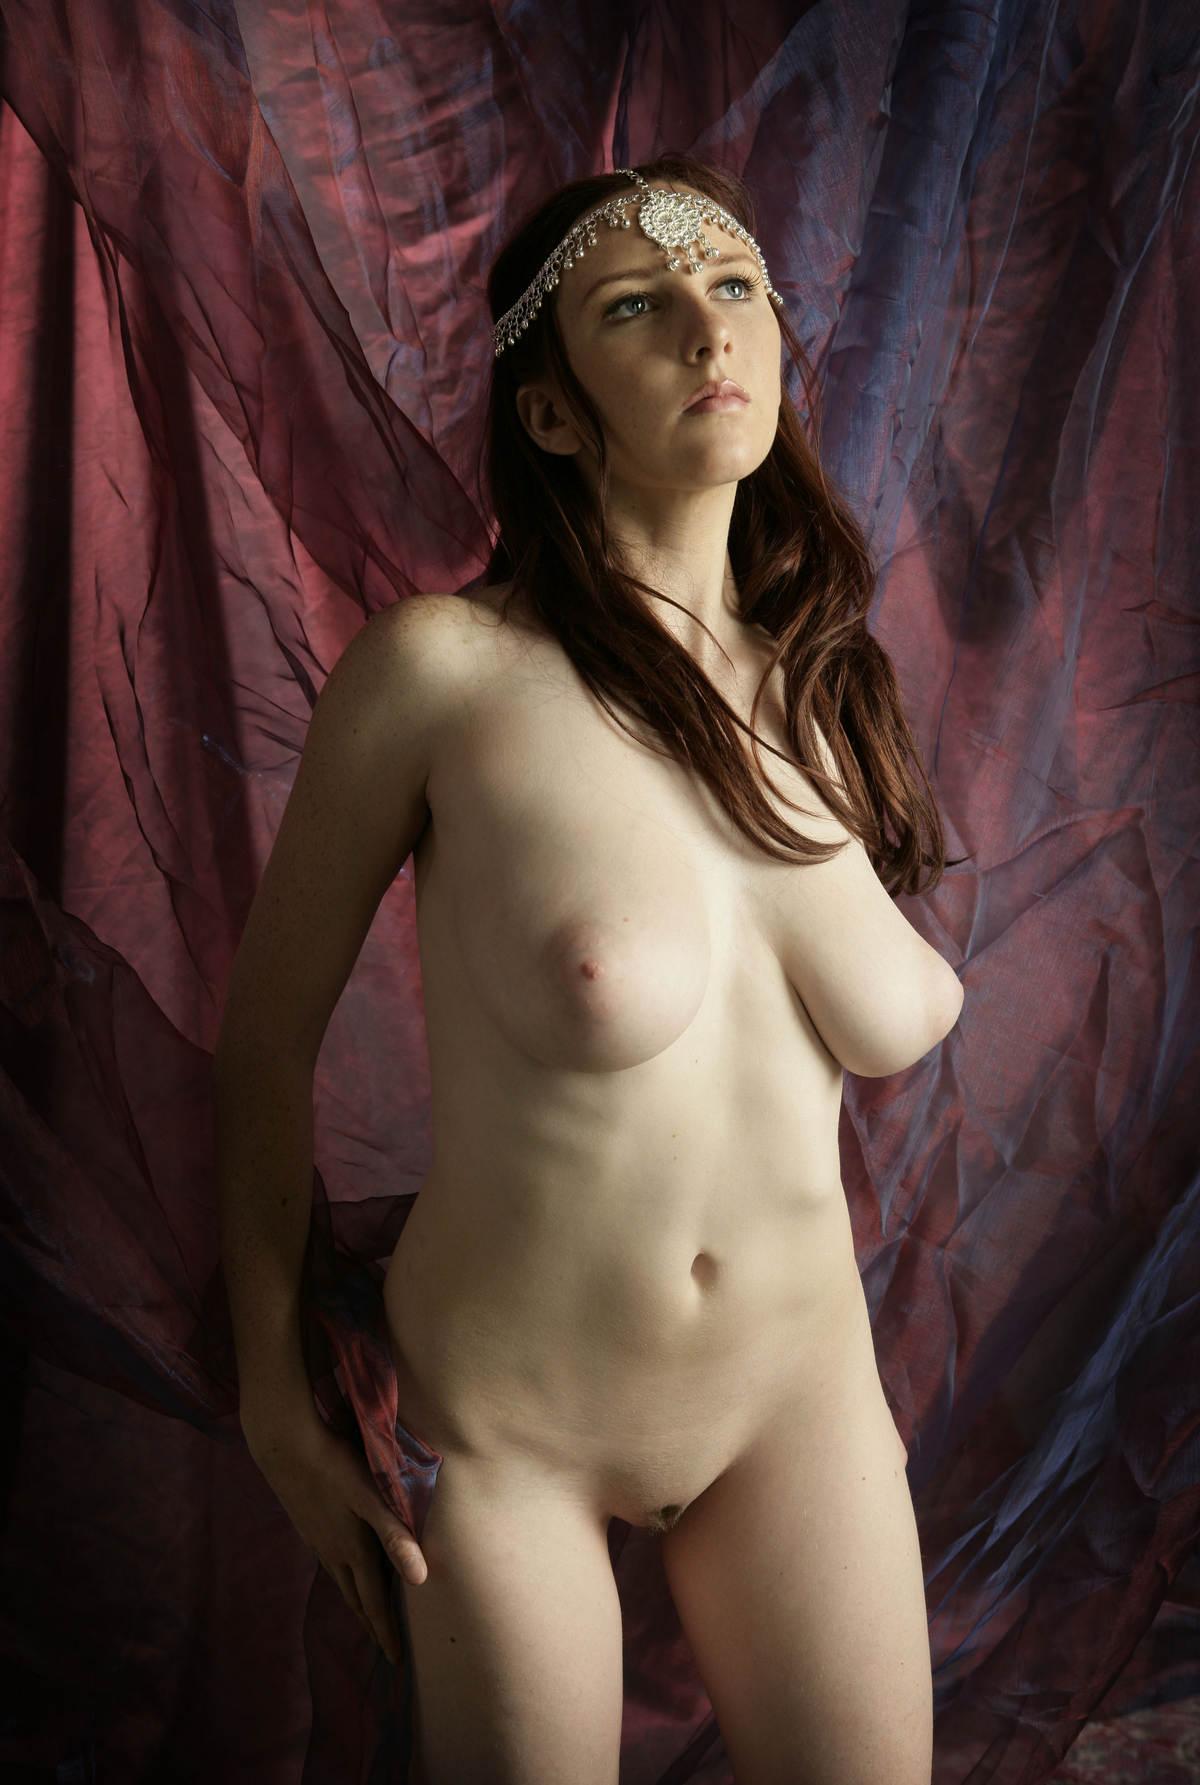 village fat aunty nude